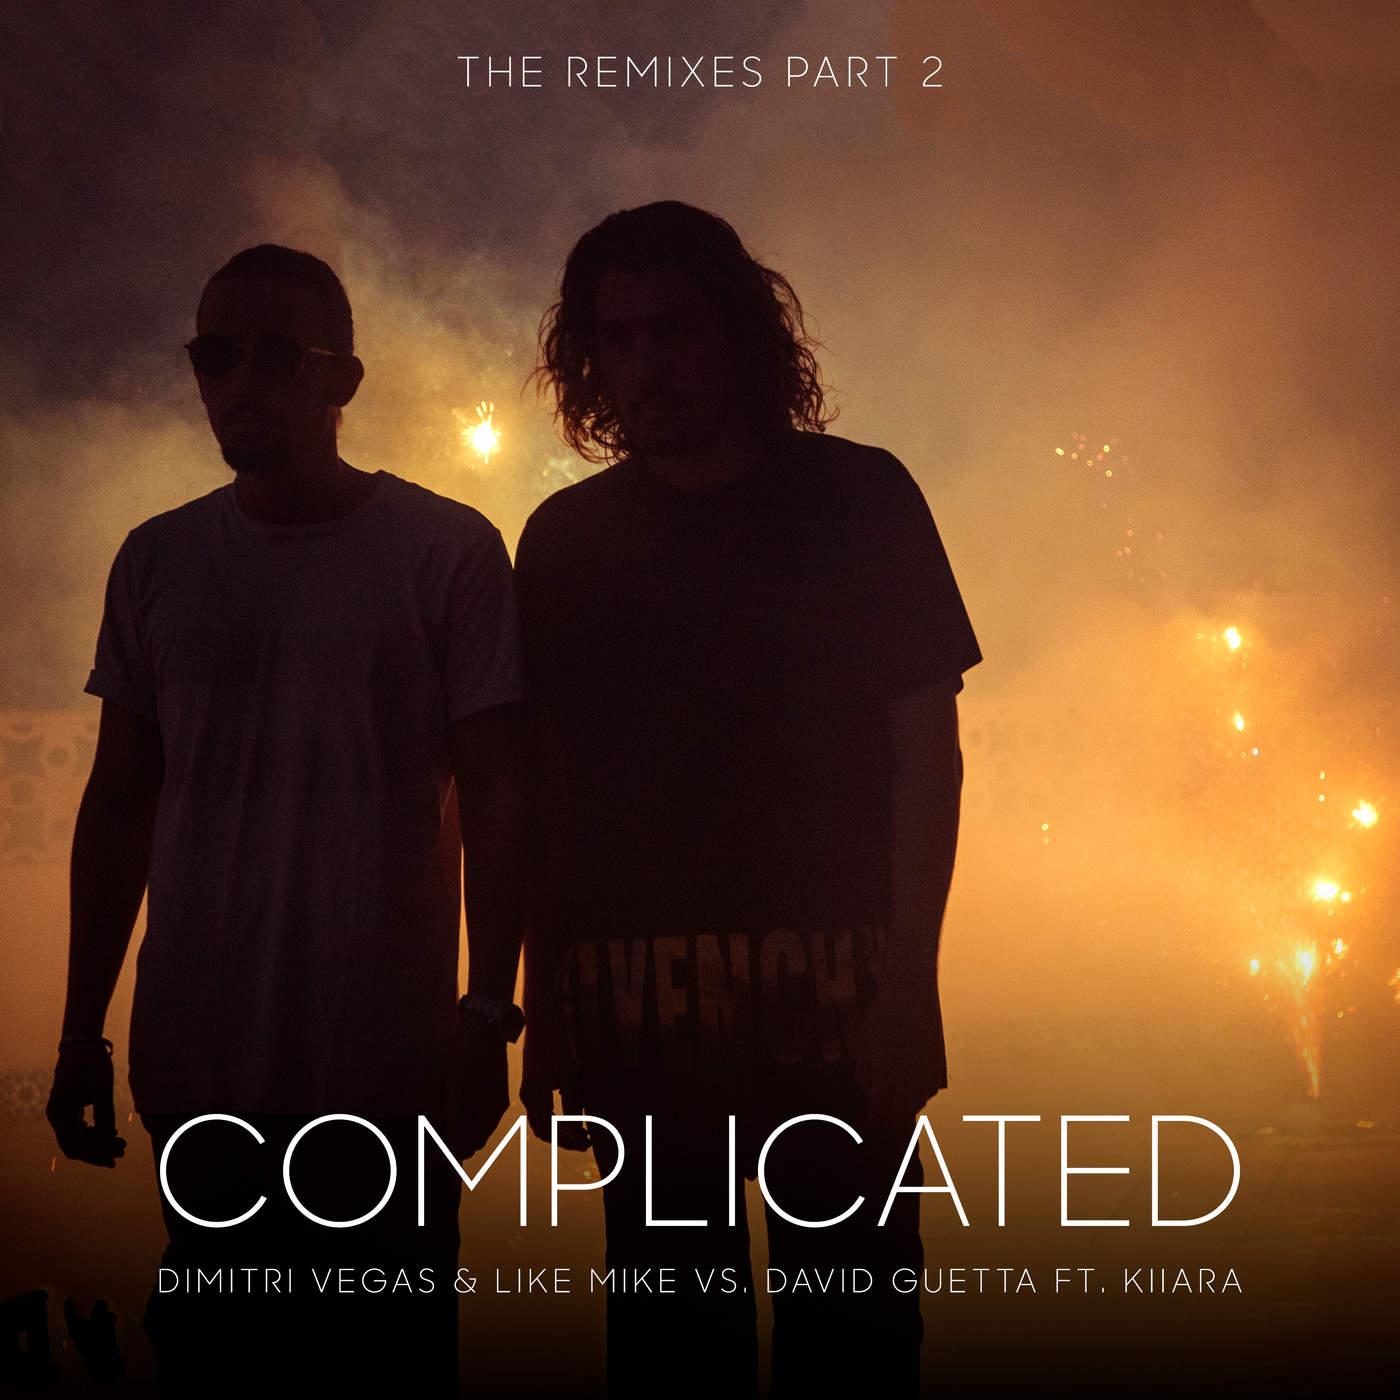 Dimitri Vegas & Like Mike & David Guetta - Complicated (feat. Kiiara) [The Remixes, Pt. 2] - Single